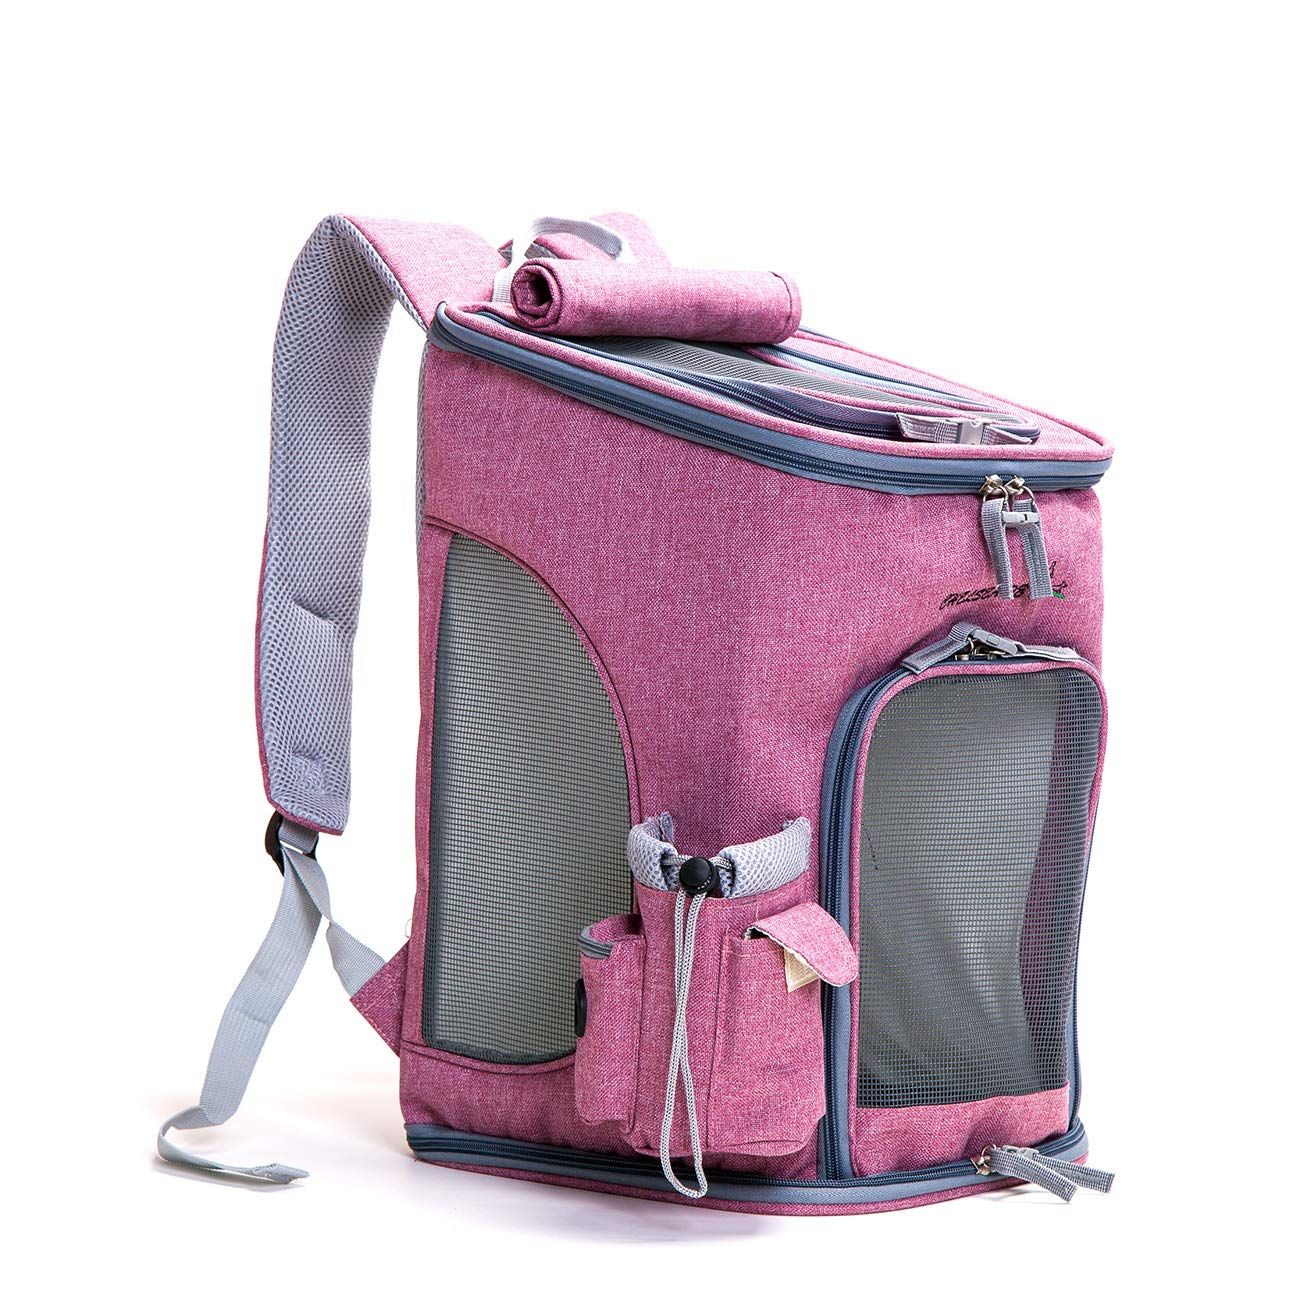 CAR SHUN Borsa Da Viaggio Per Cani Borsa Da Viaggio Per Cani Borsa Da Viaggio Pieghevole Per Cani Da Viaggio Pieghevole,rosa